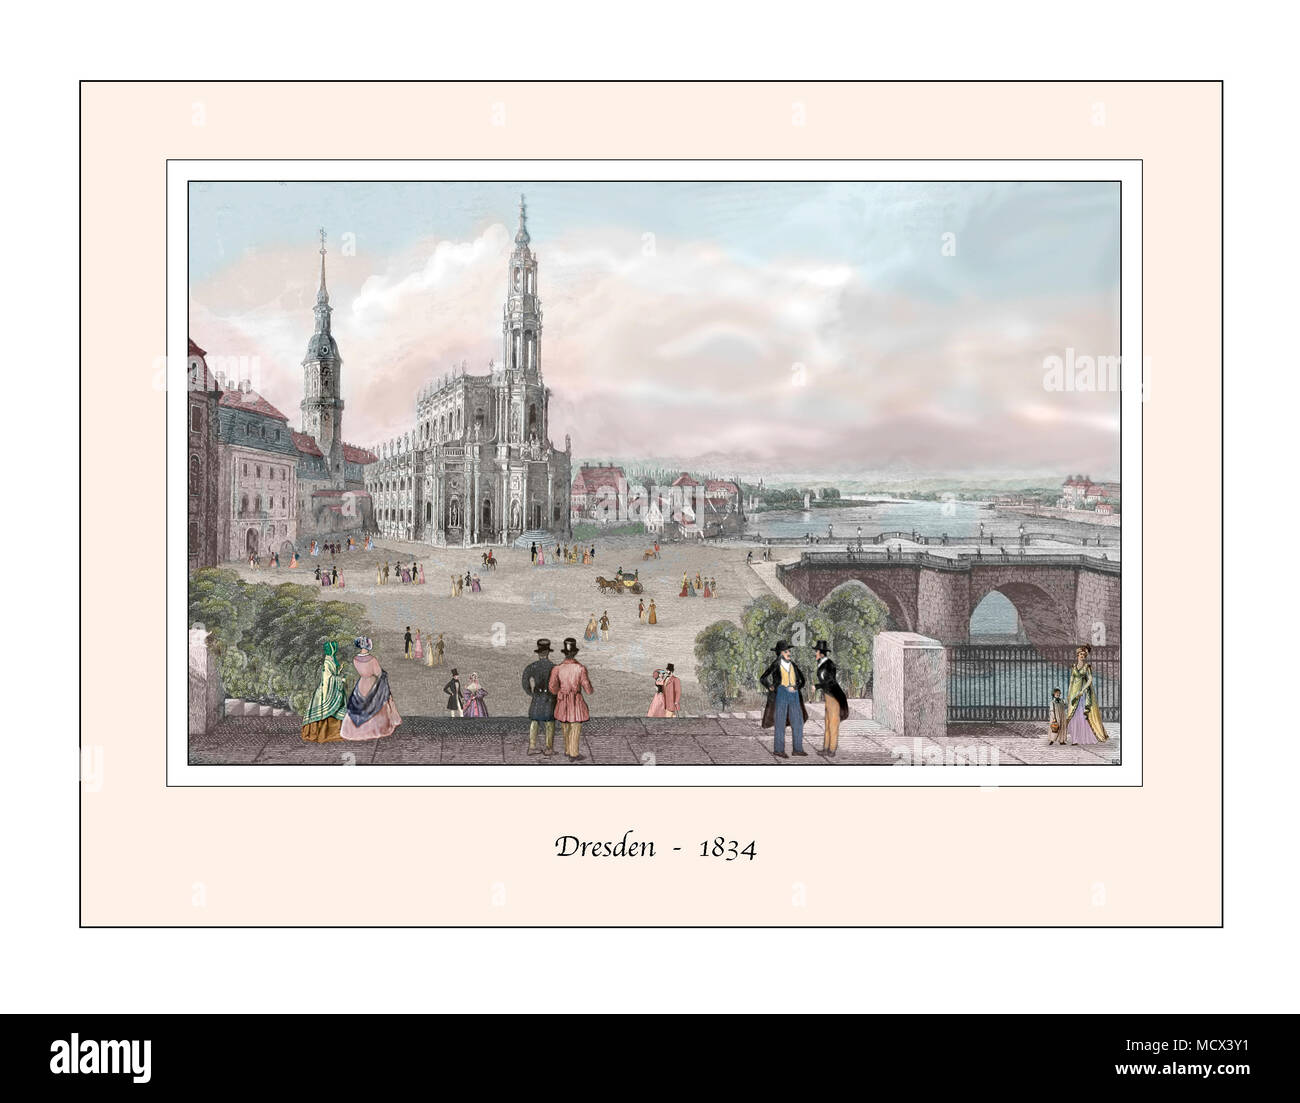 Dresden Original Design based on a 19th century Engraving - Stock Image